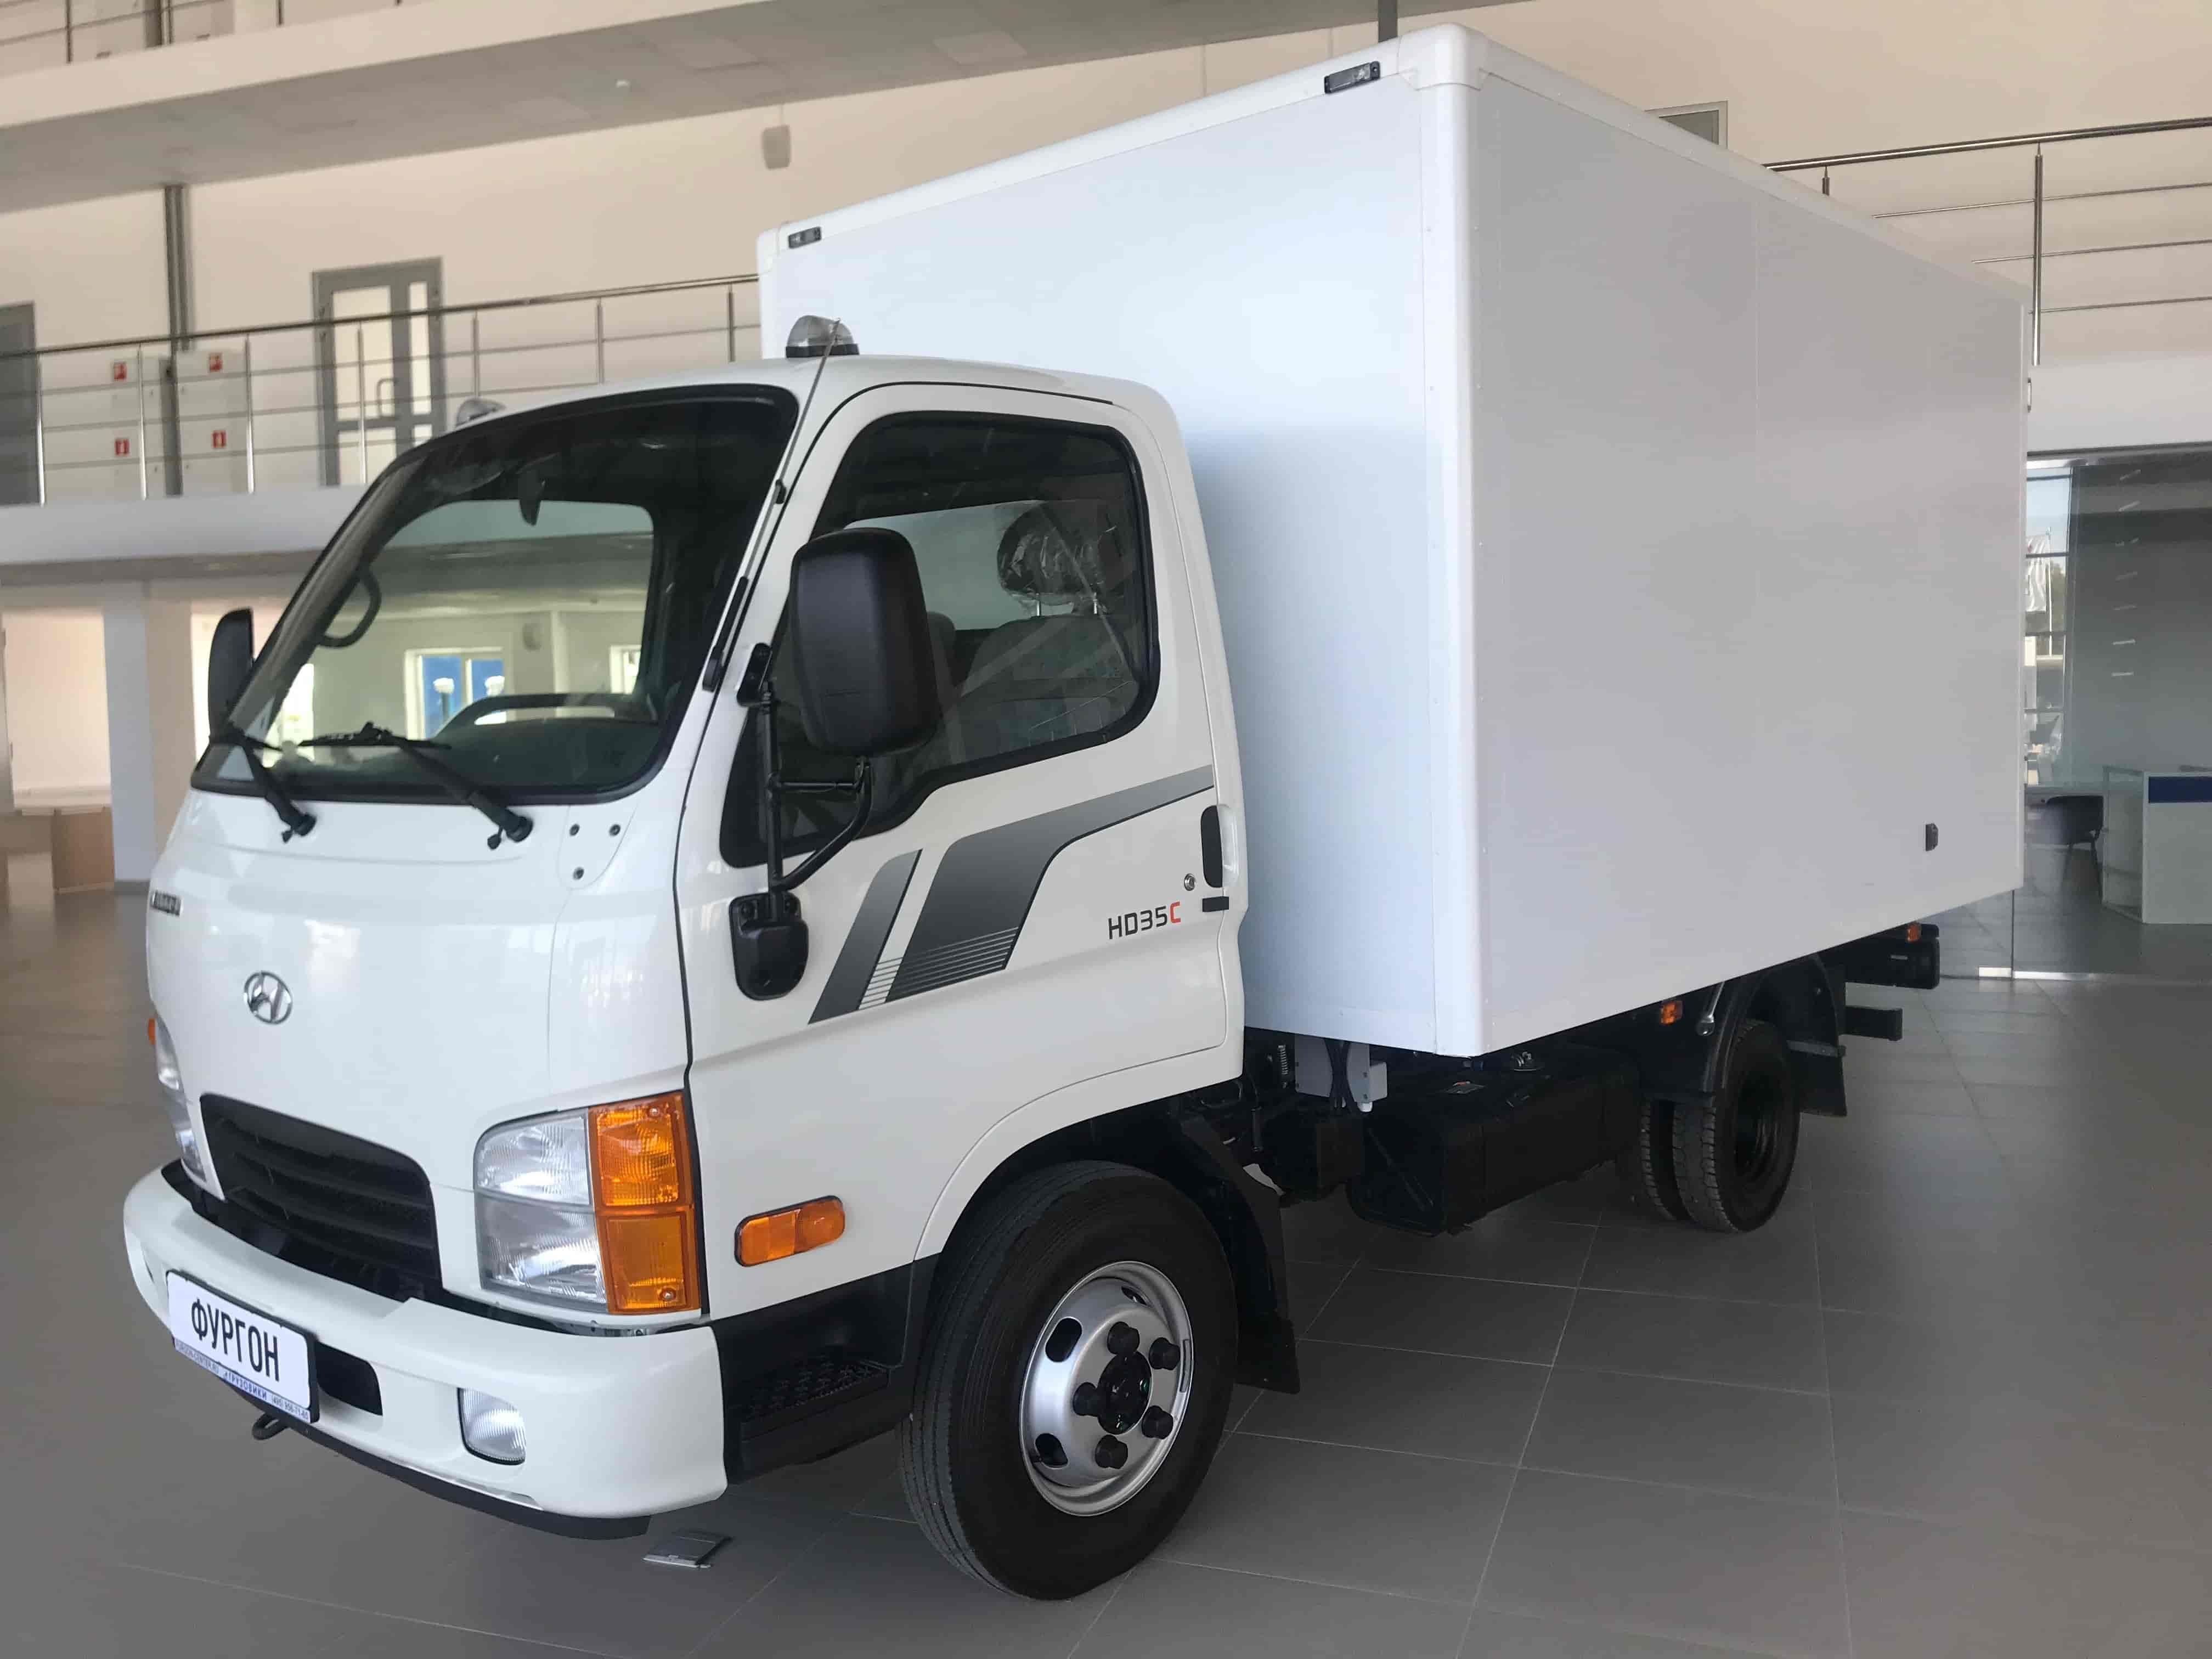 Hyundai HD 35 City (сэндвич фургон ЦТТМ)